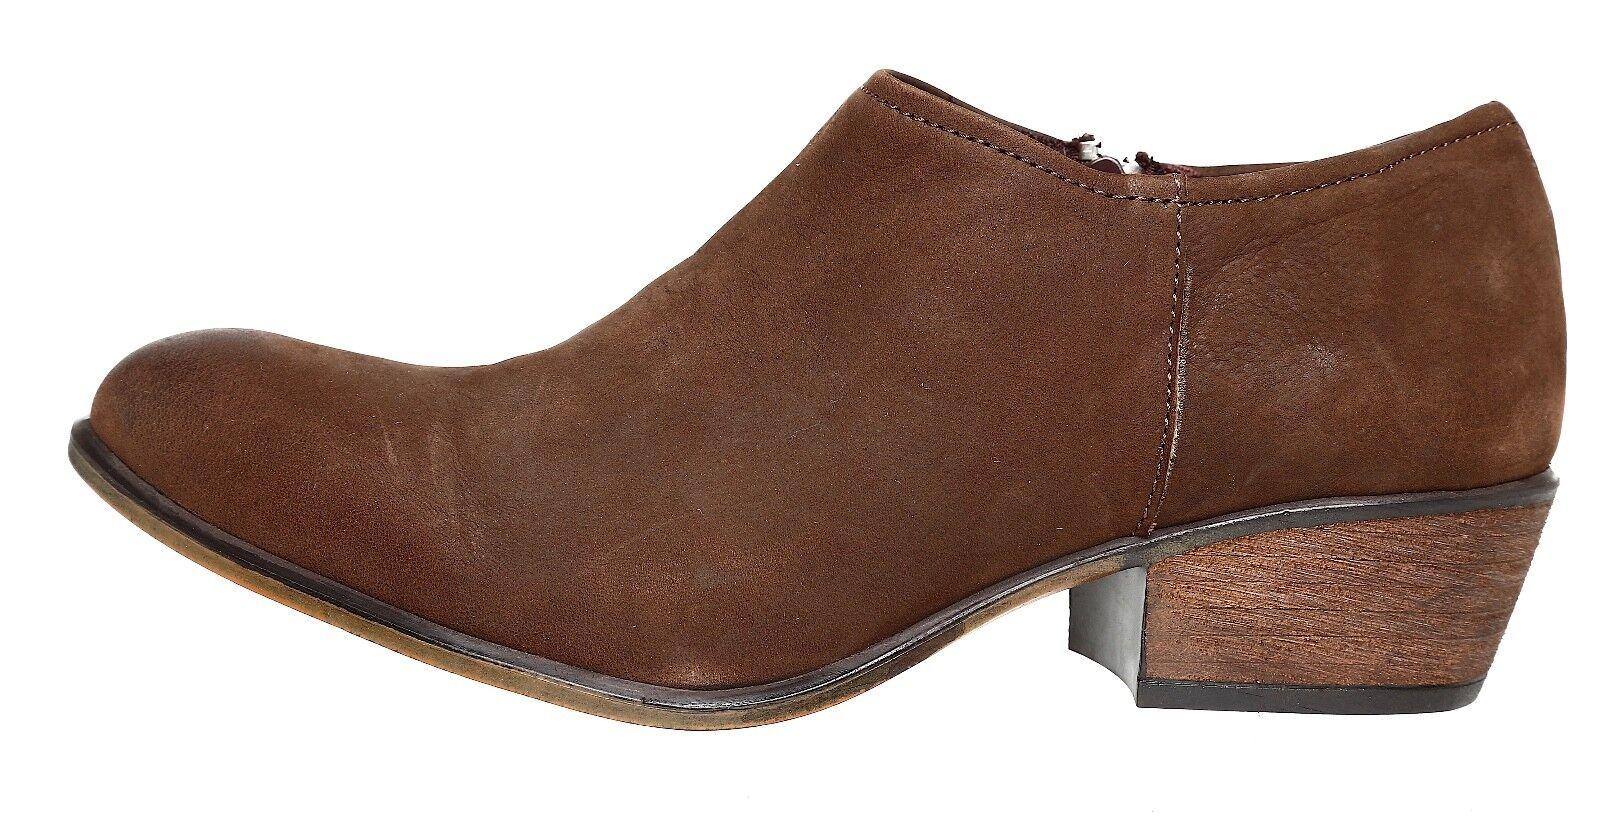 Steve Madden Katyy Leather Stiefel braun damen Sz 9 M 4068